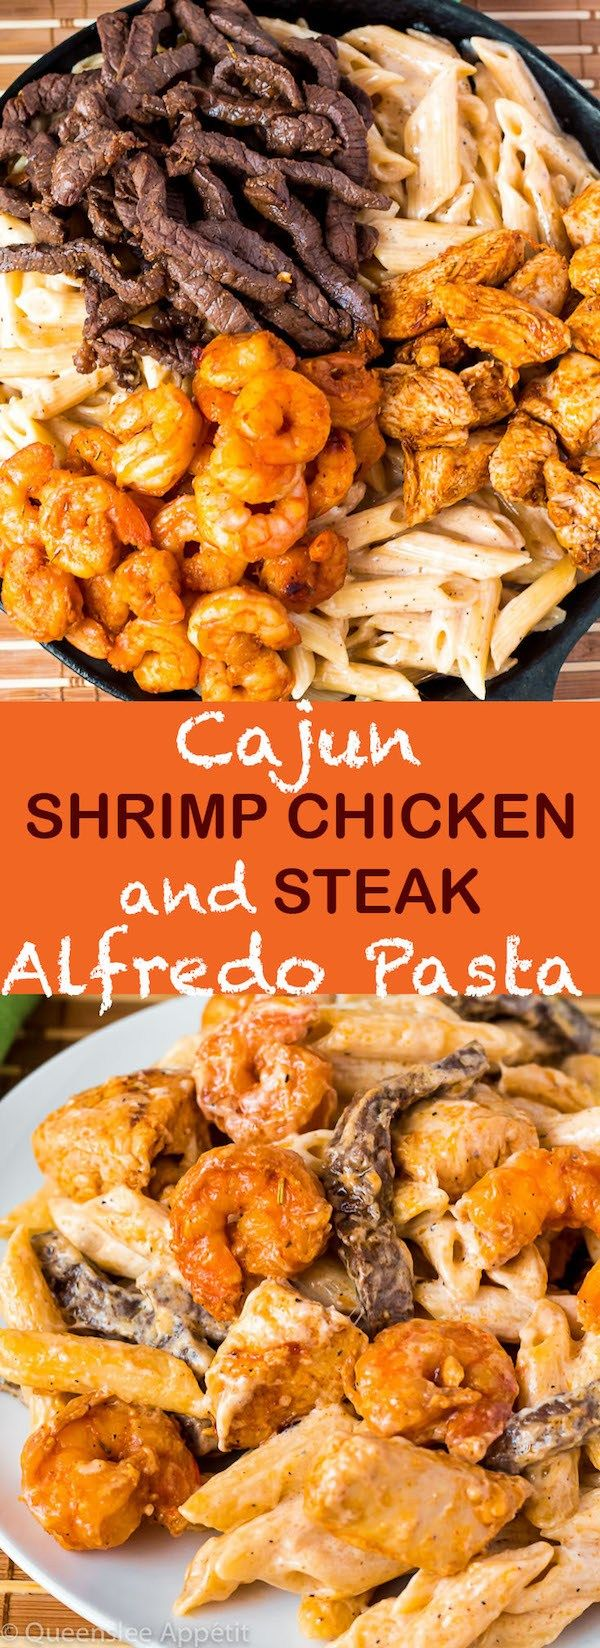 Cajun Shrimp Chicken and Steak Alfredo Pasta